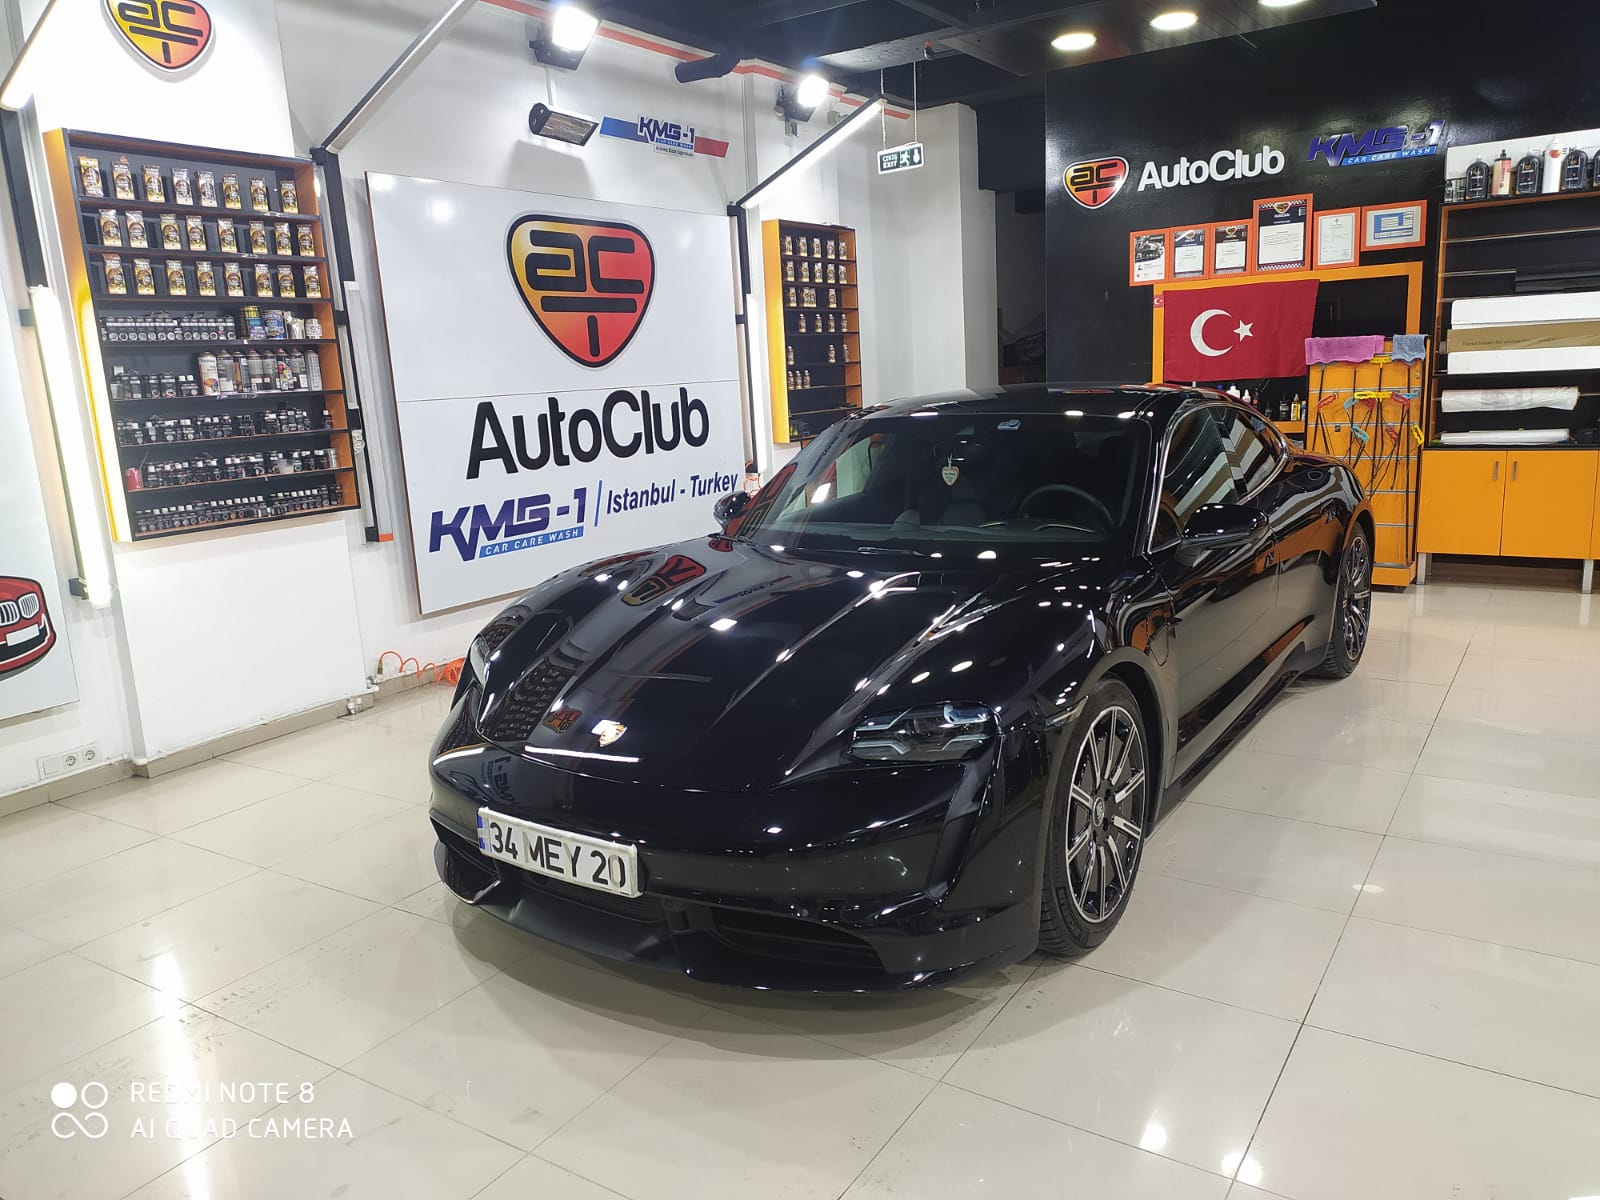 AutoClub KMG1 - İstanbul Ümraniye Şerifali